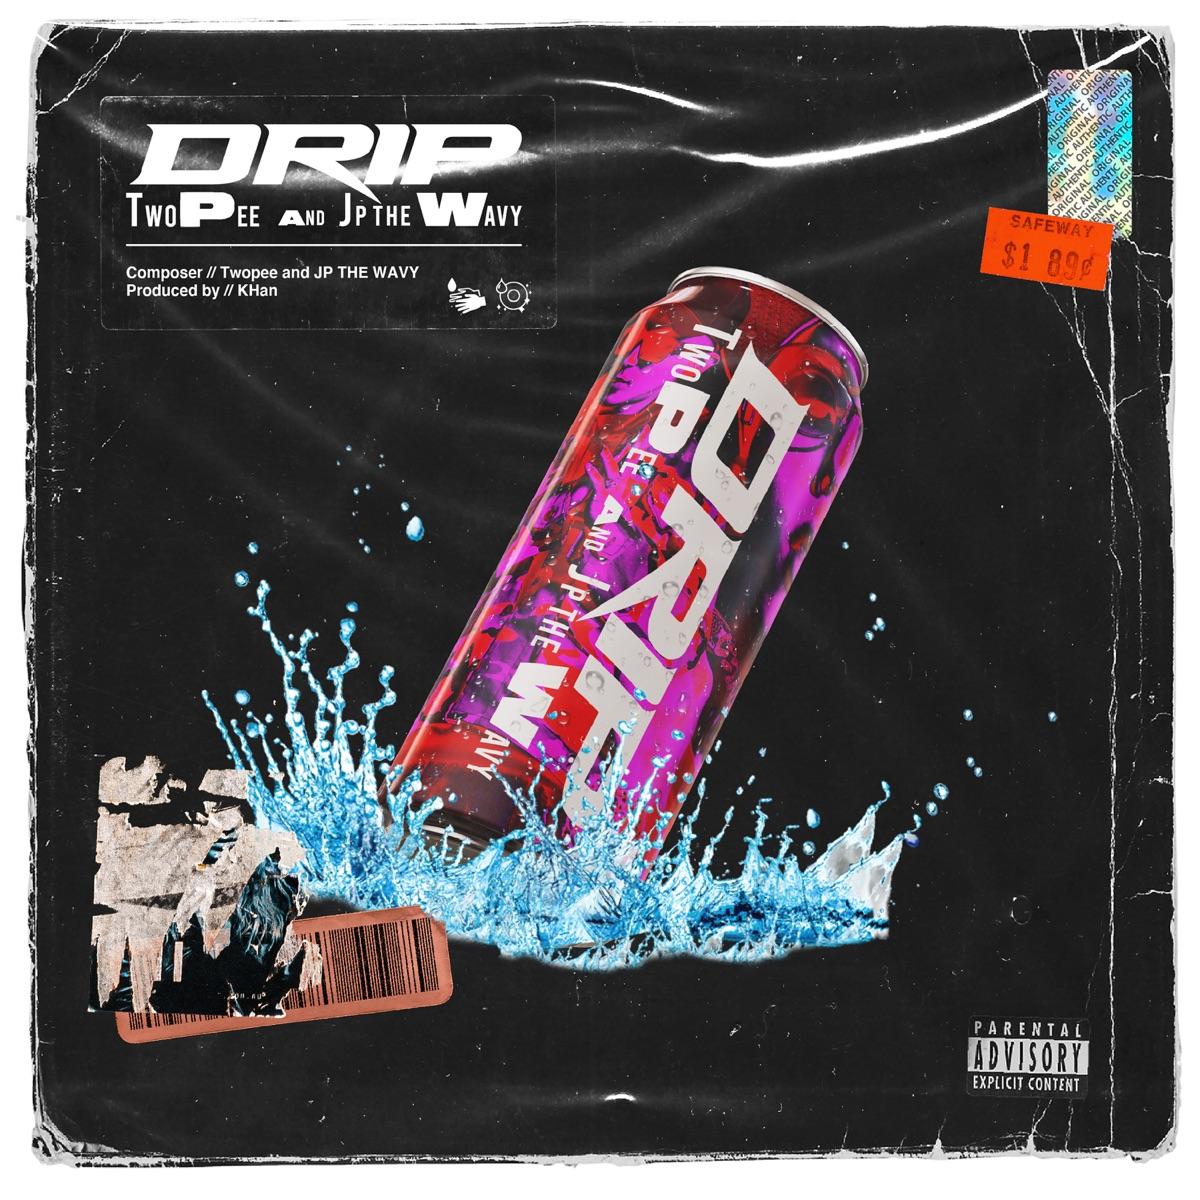 『JP THE WAVY & TWOPEE - DRIP』収録の『DRIP』ジャケット